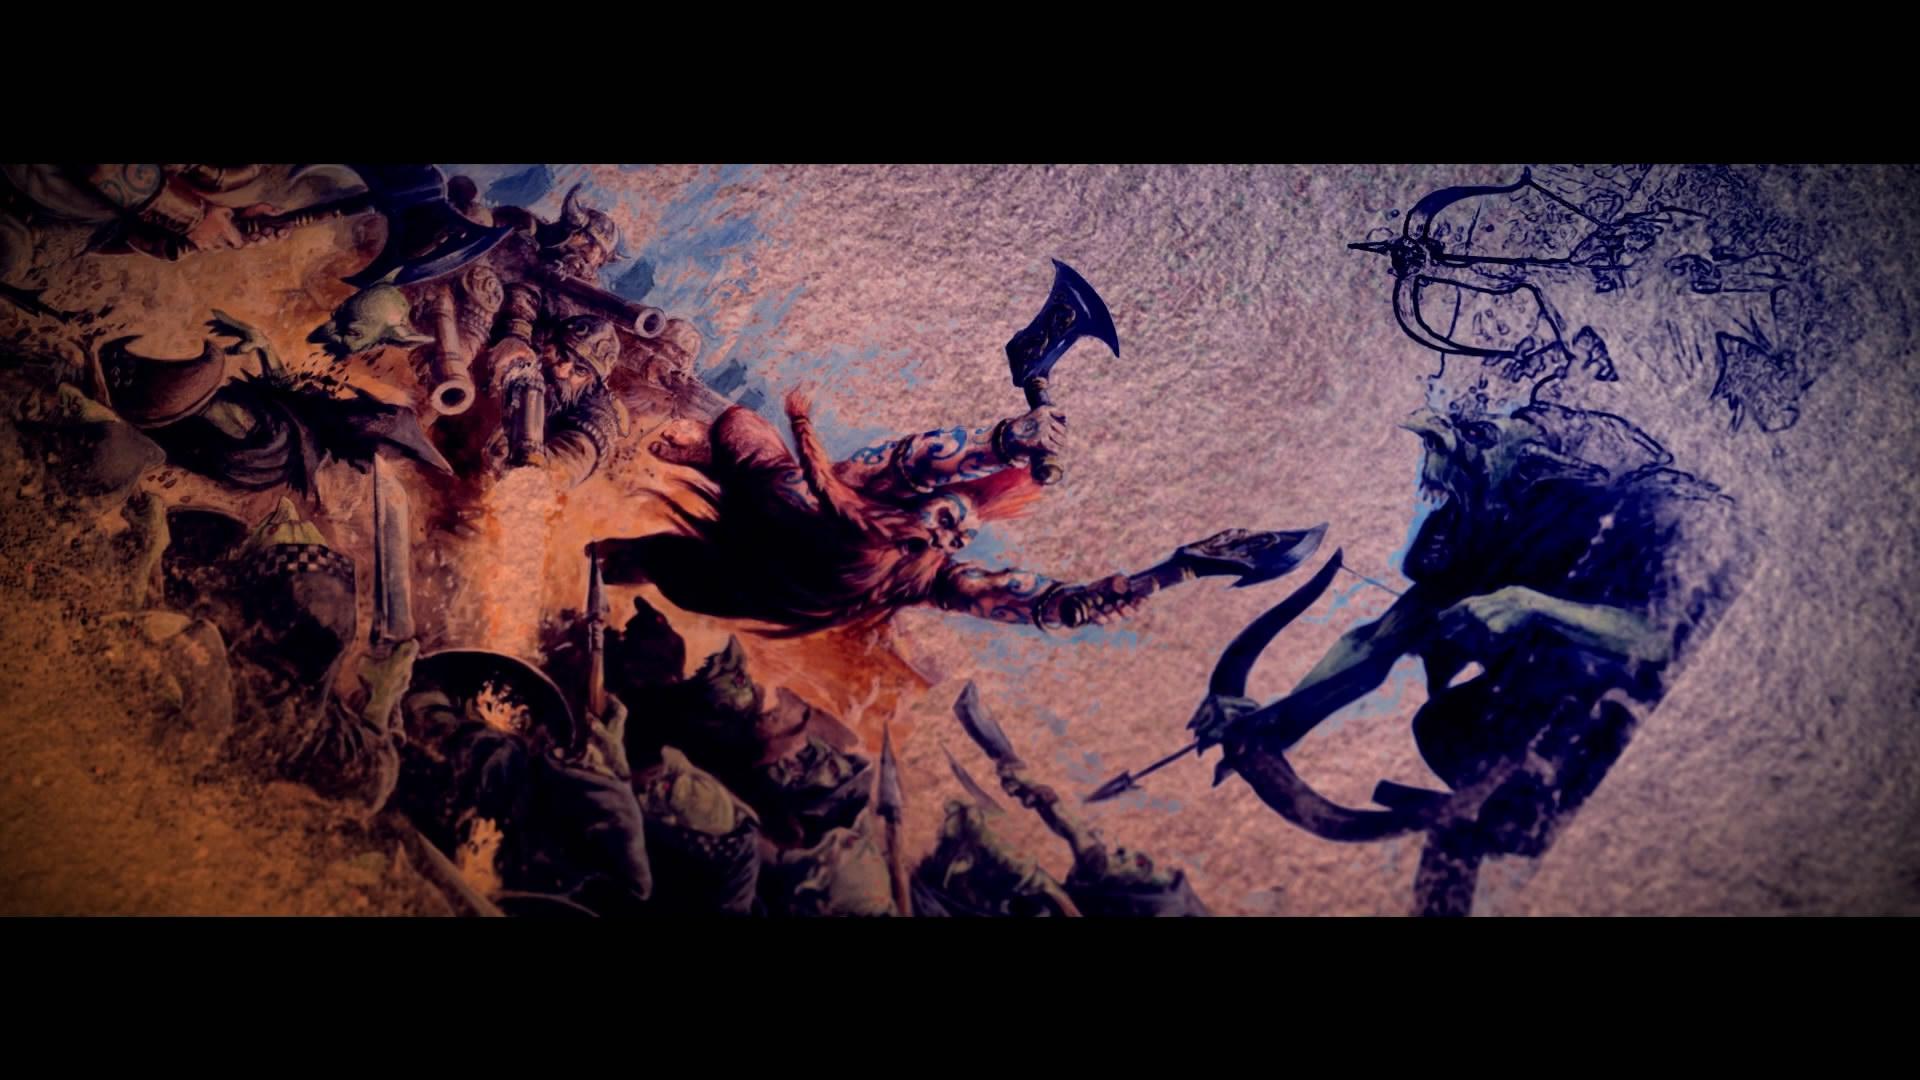 ARPG《战锤:混沌祸根》新预告 矮人屠夫爽快厮杀